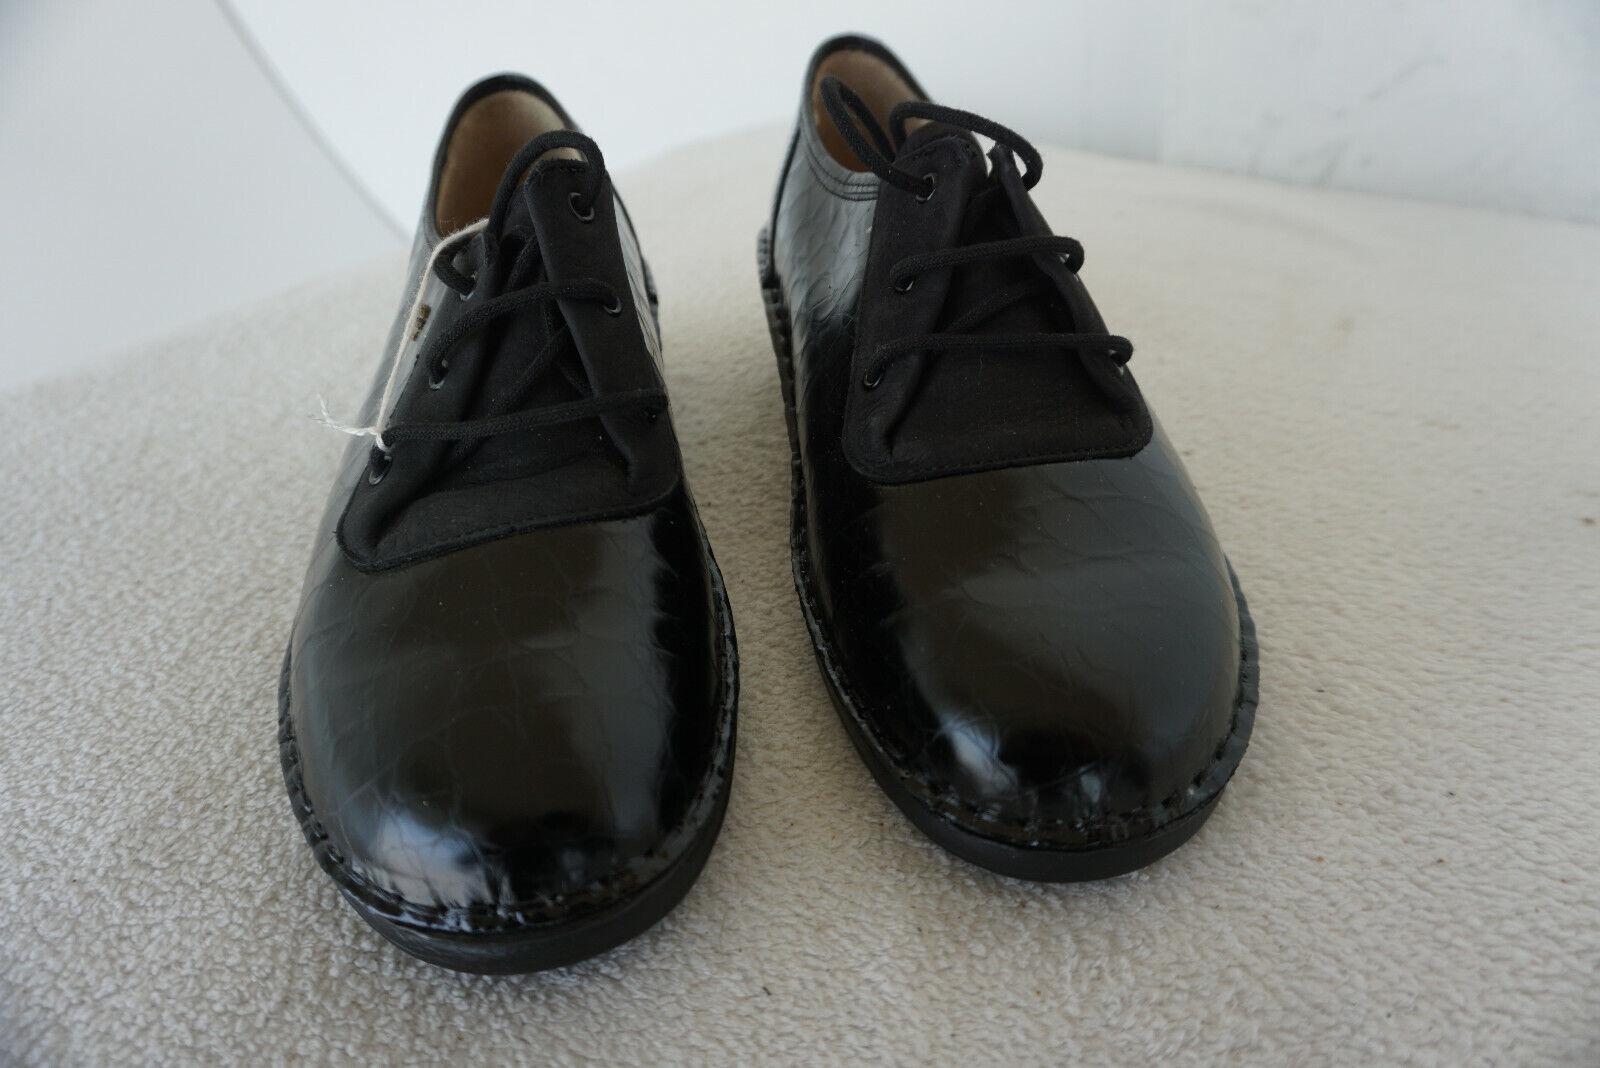 FINN COMFORT Séville Chaussures Femmes Chaussure Lacée Taille 6 39 Noir en Cuir Véritable Neuf